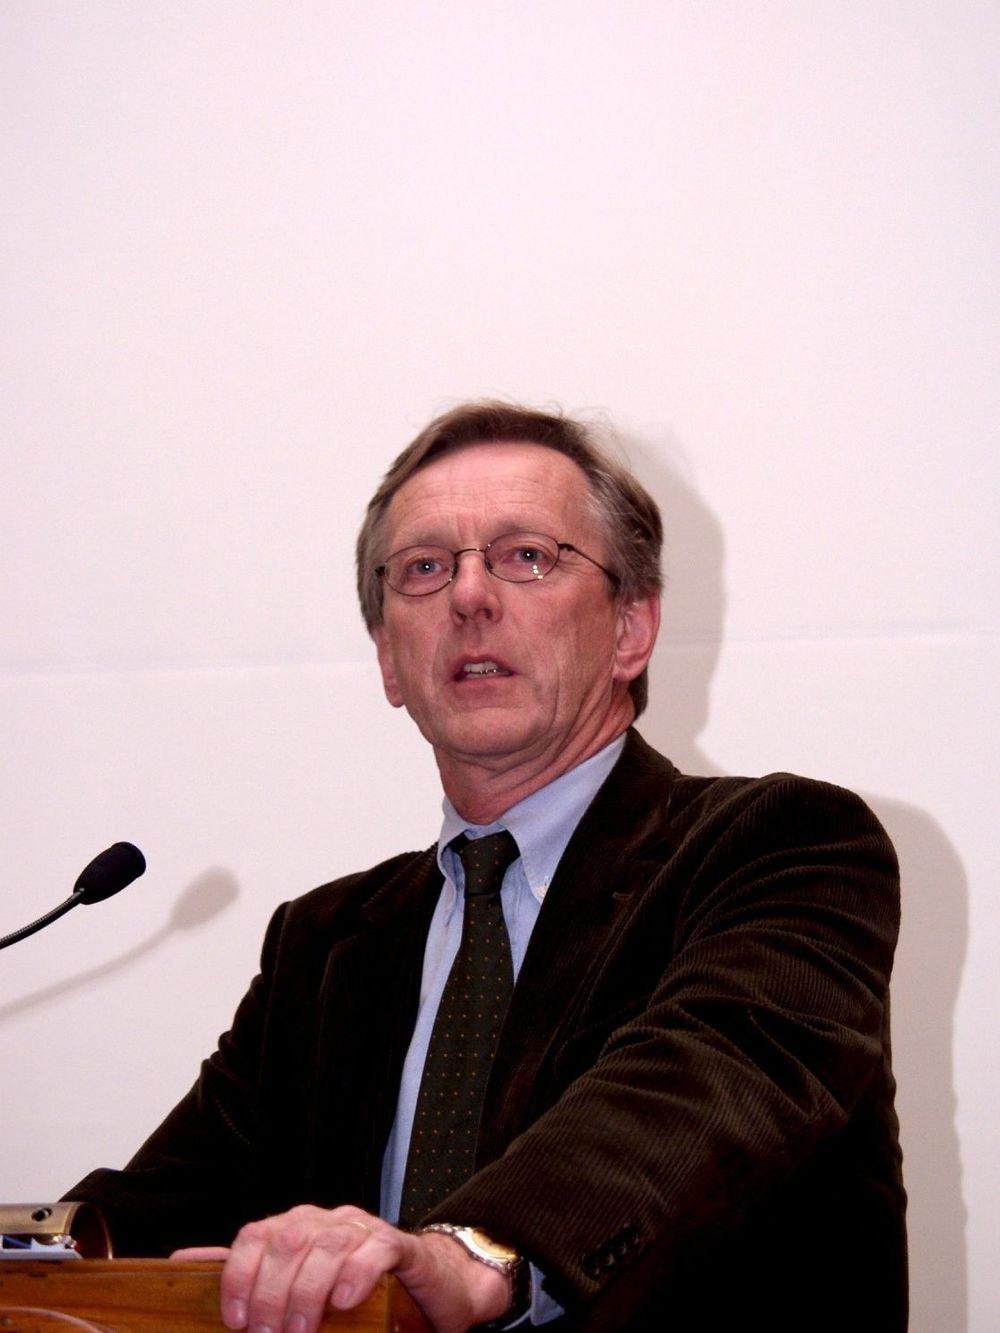 Administrerende direktør i Oljeindustriens Landsforening (OLF), Per Terje Vold.